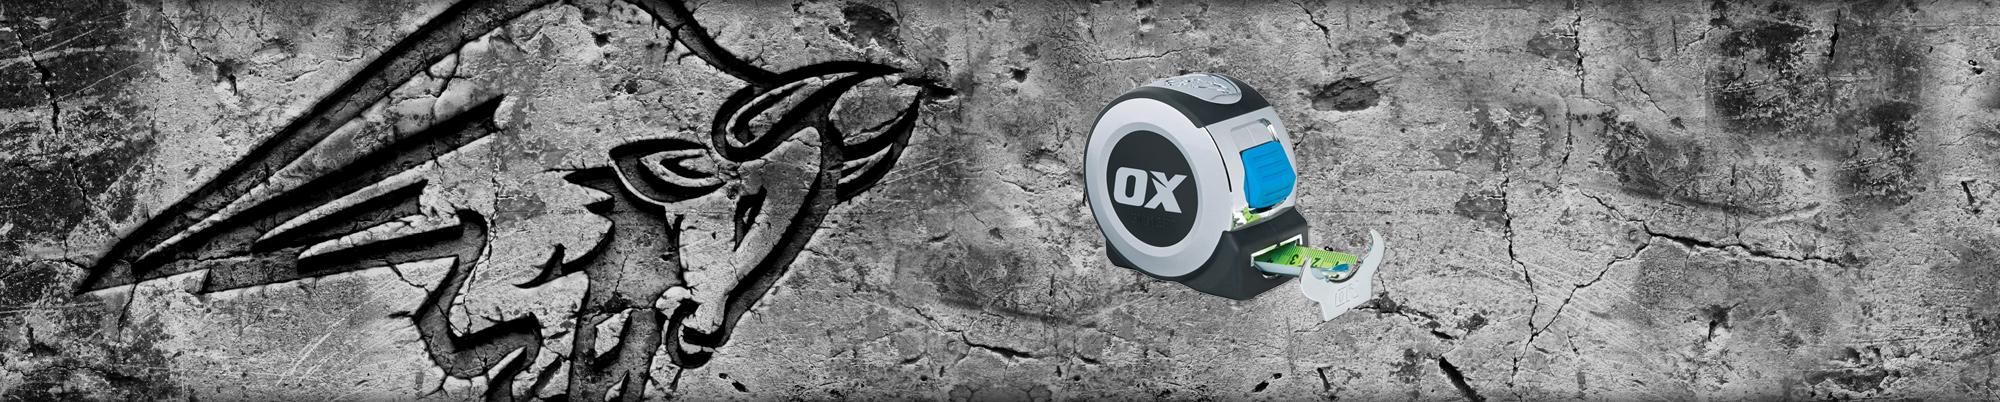 Ox Edition Mattband